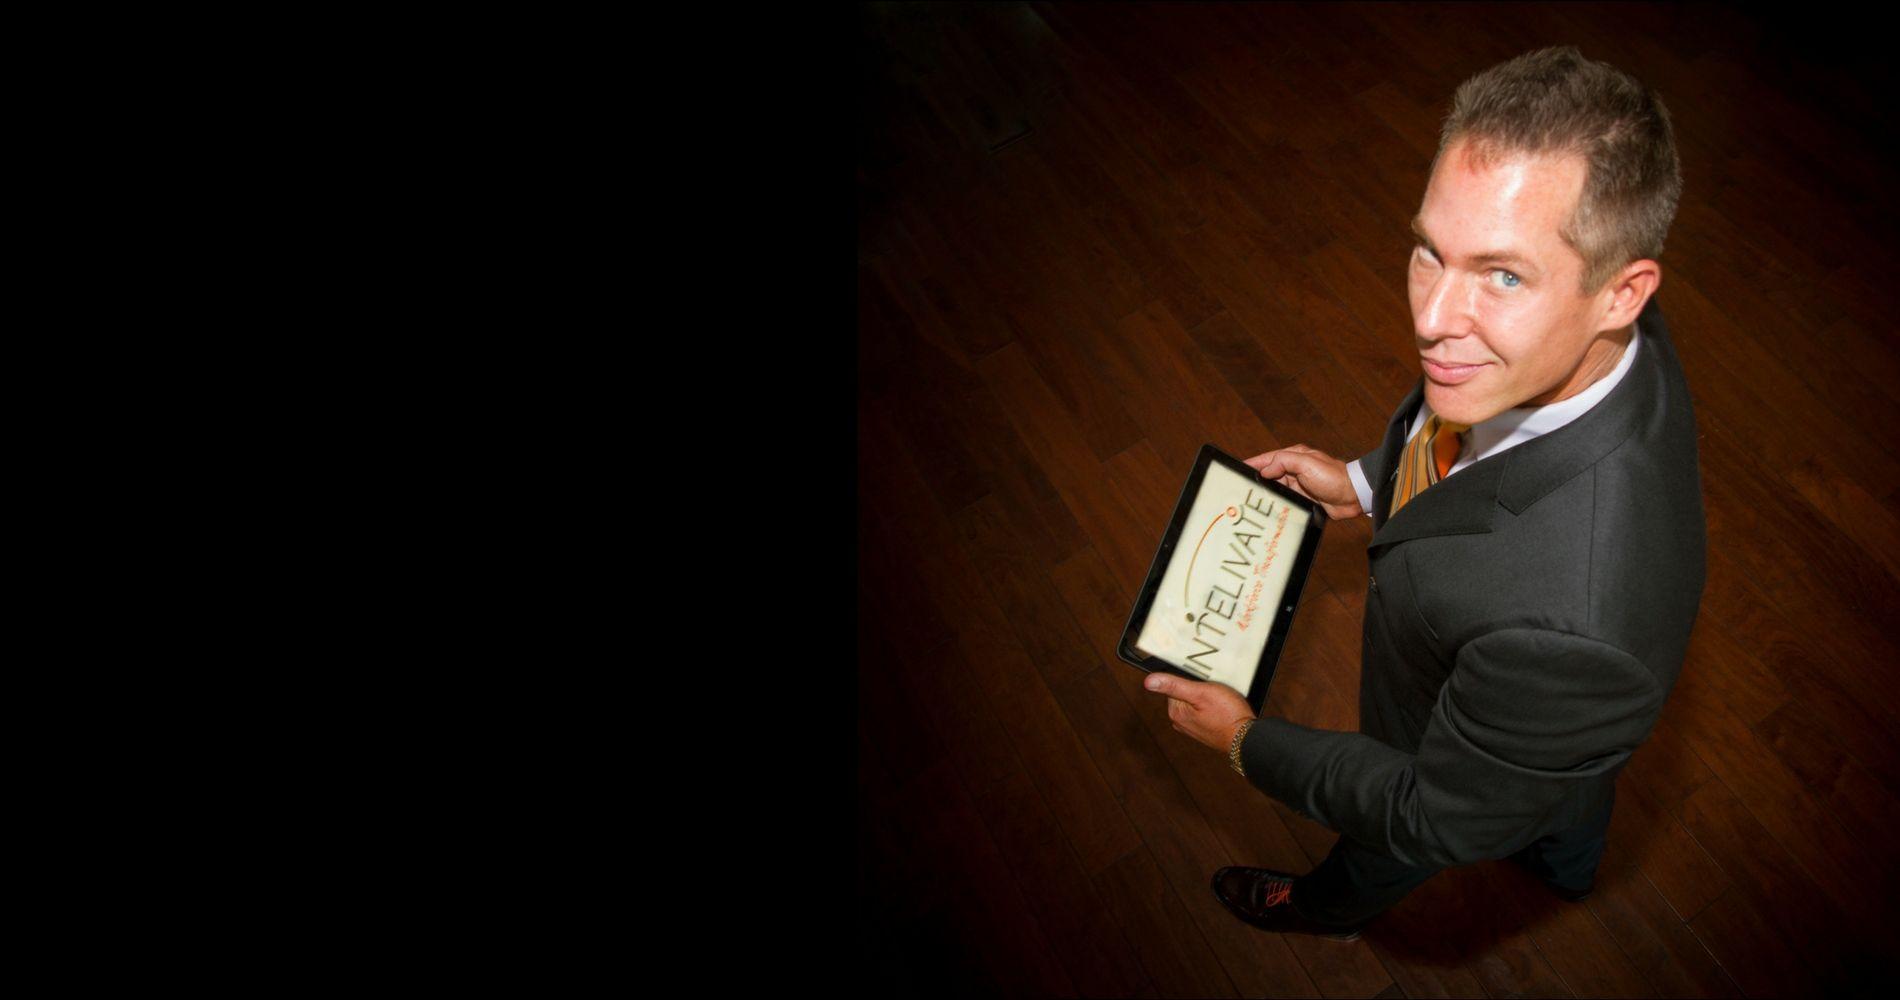 kris fannin business consultant training expert leadership coach intelivate founder